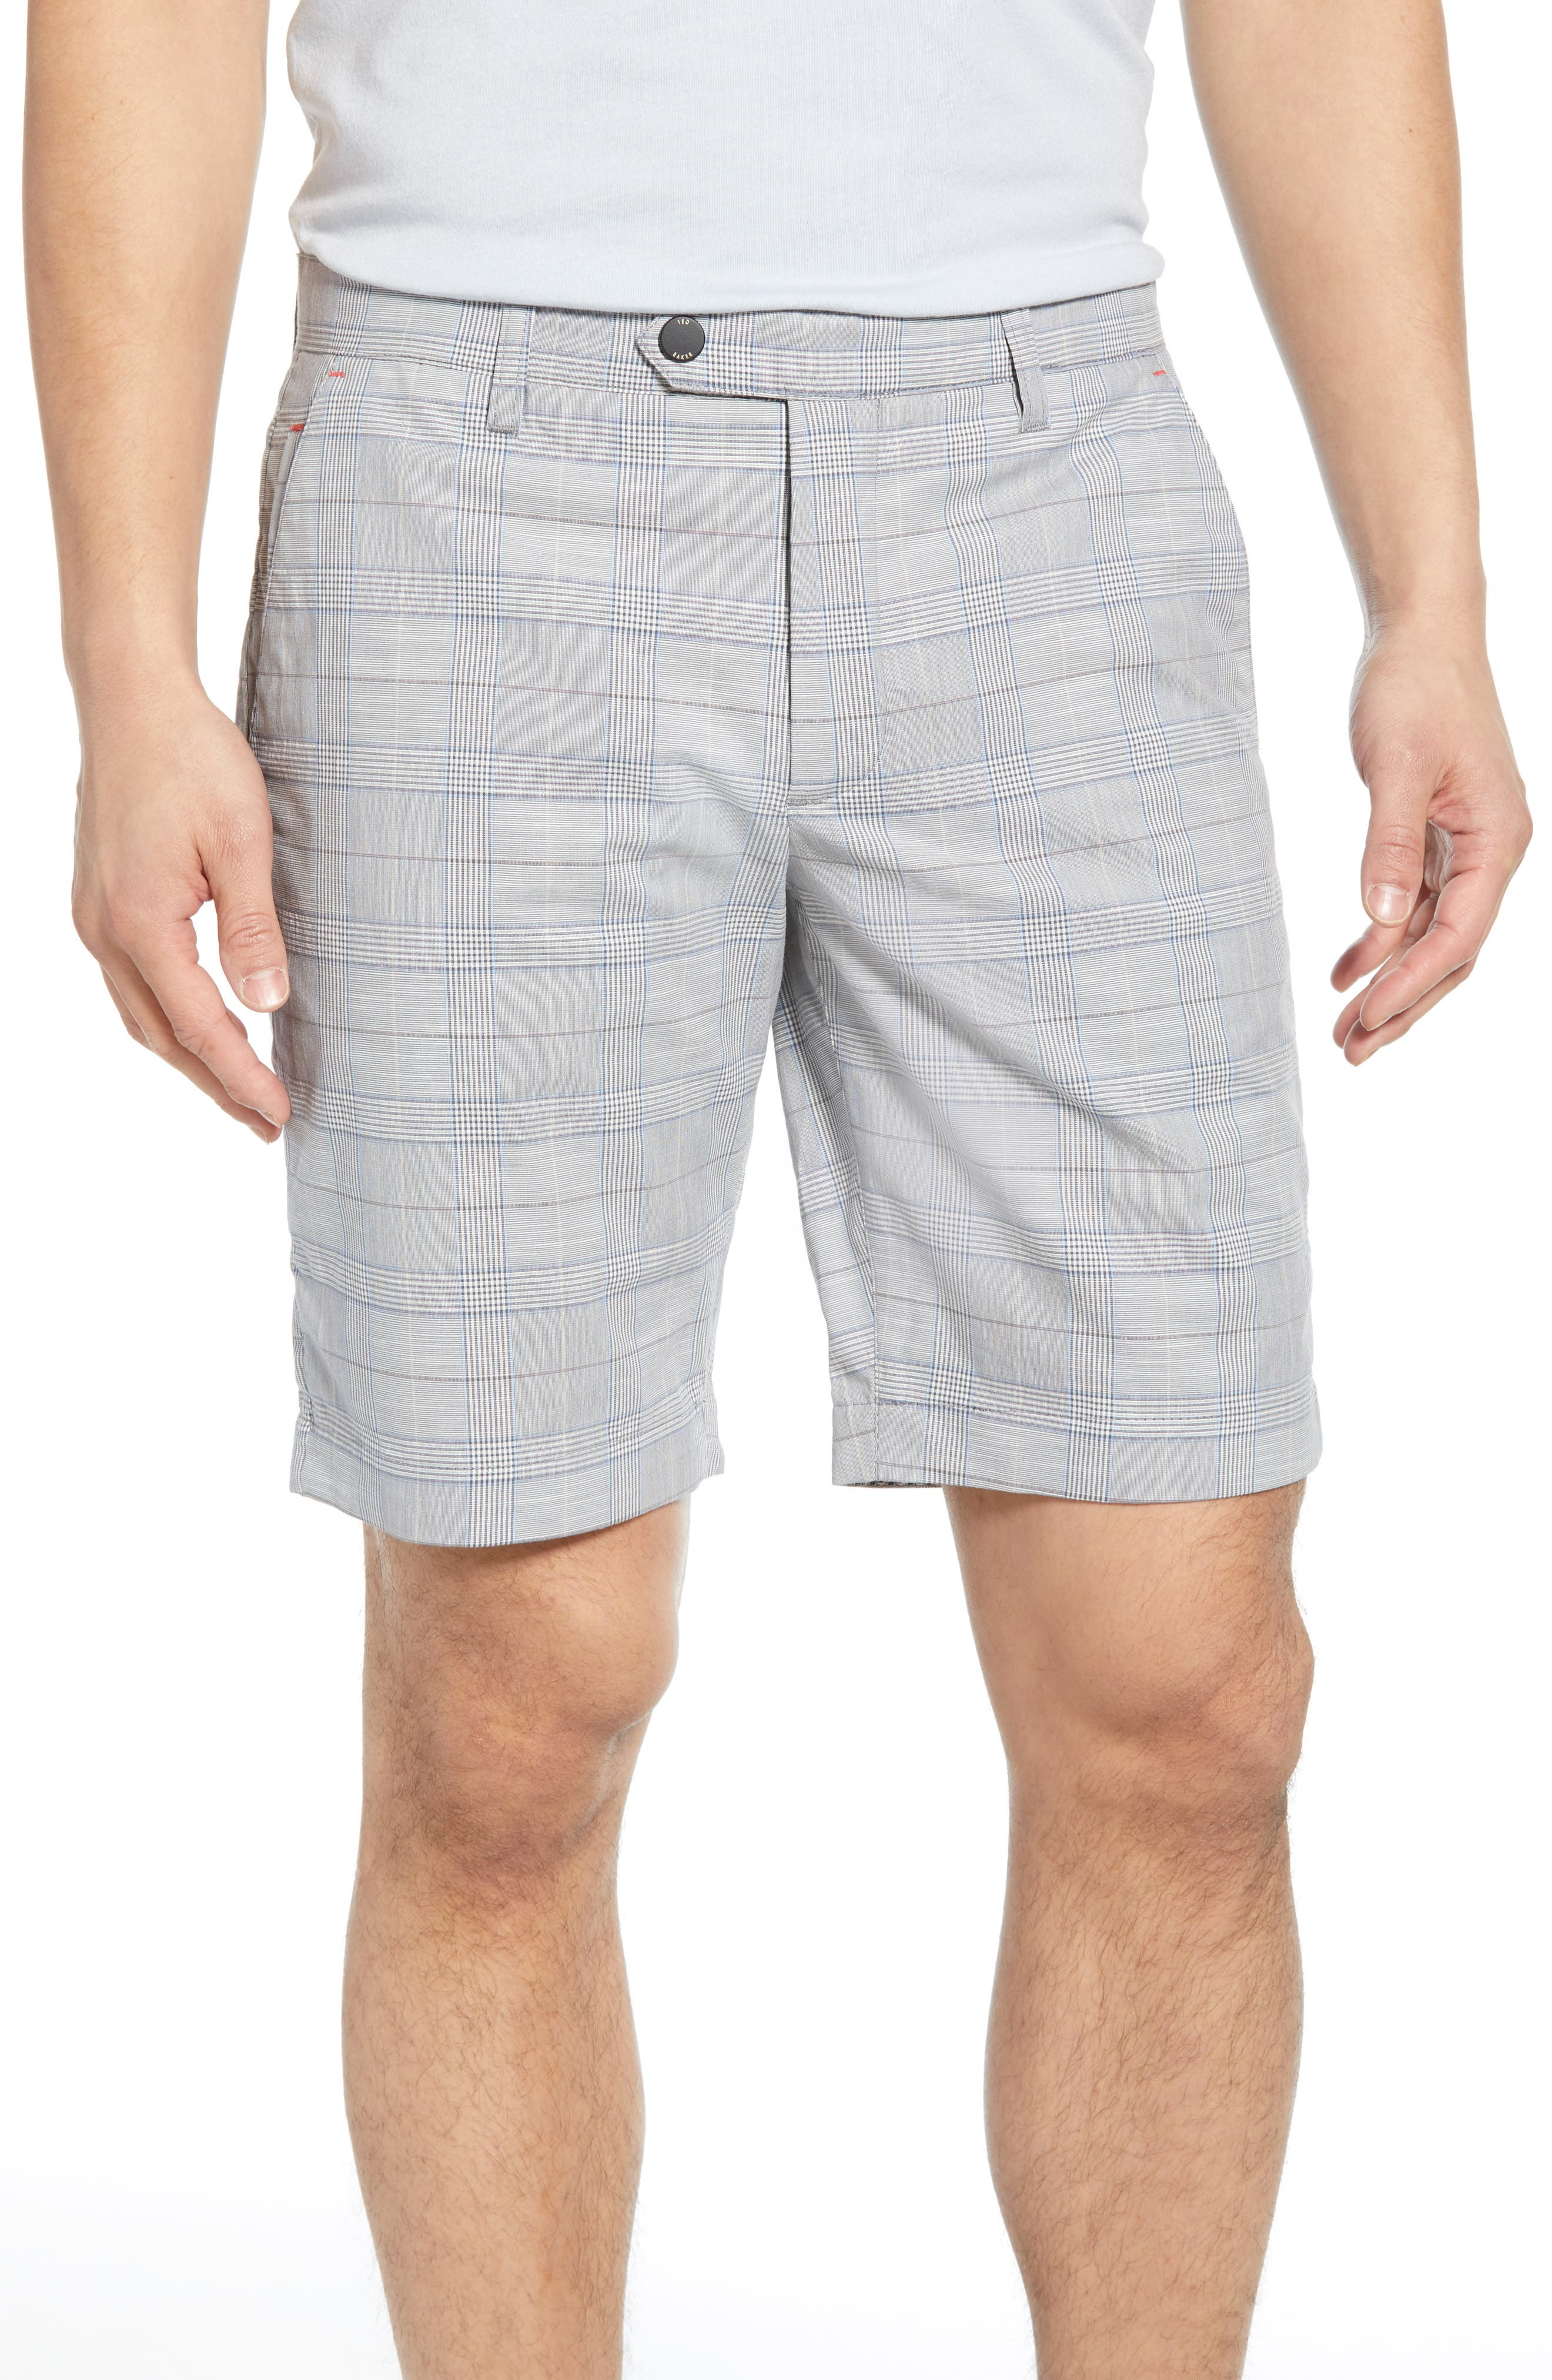 TED BAKER LONDON, Easiee Slim Fit Check Golf Shorts, Main thumbnail 1, color, GREY